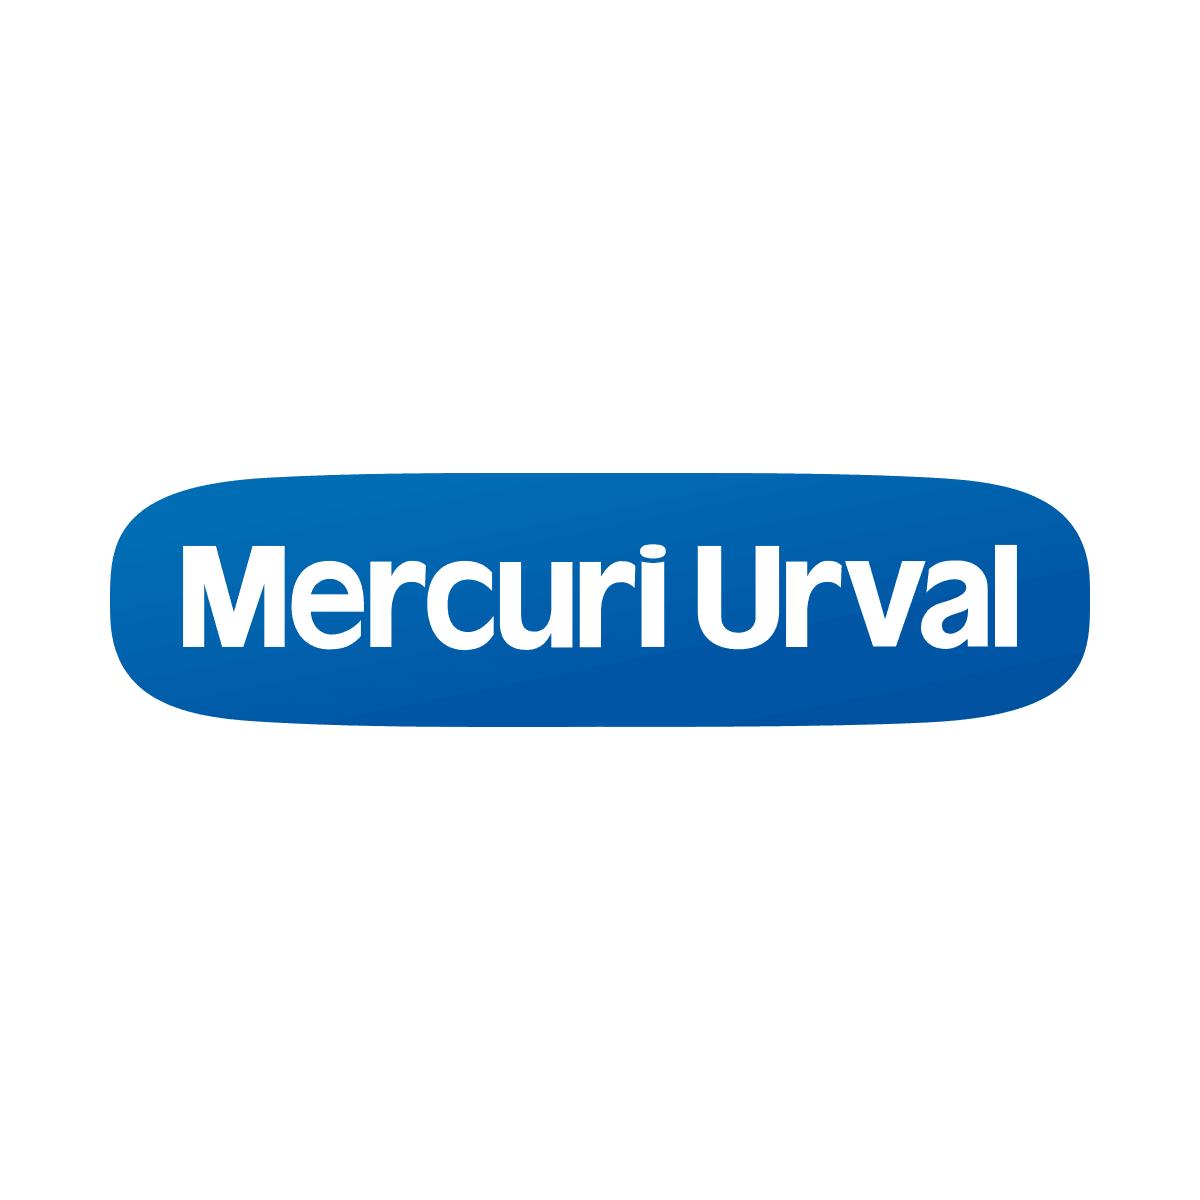 mercuri-urval-share.png